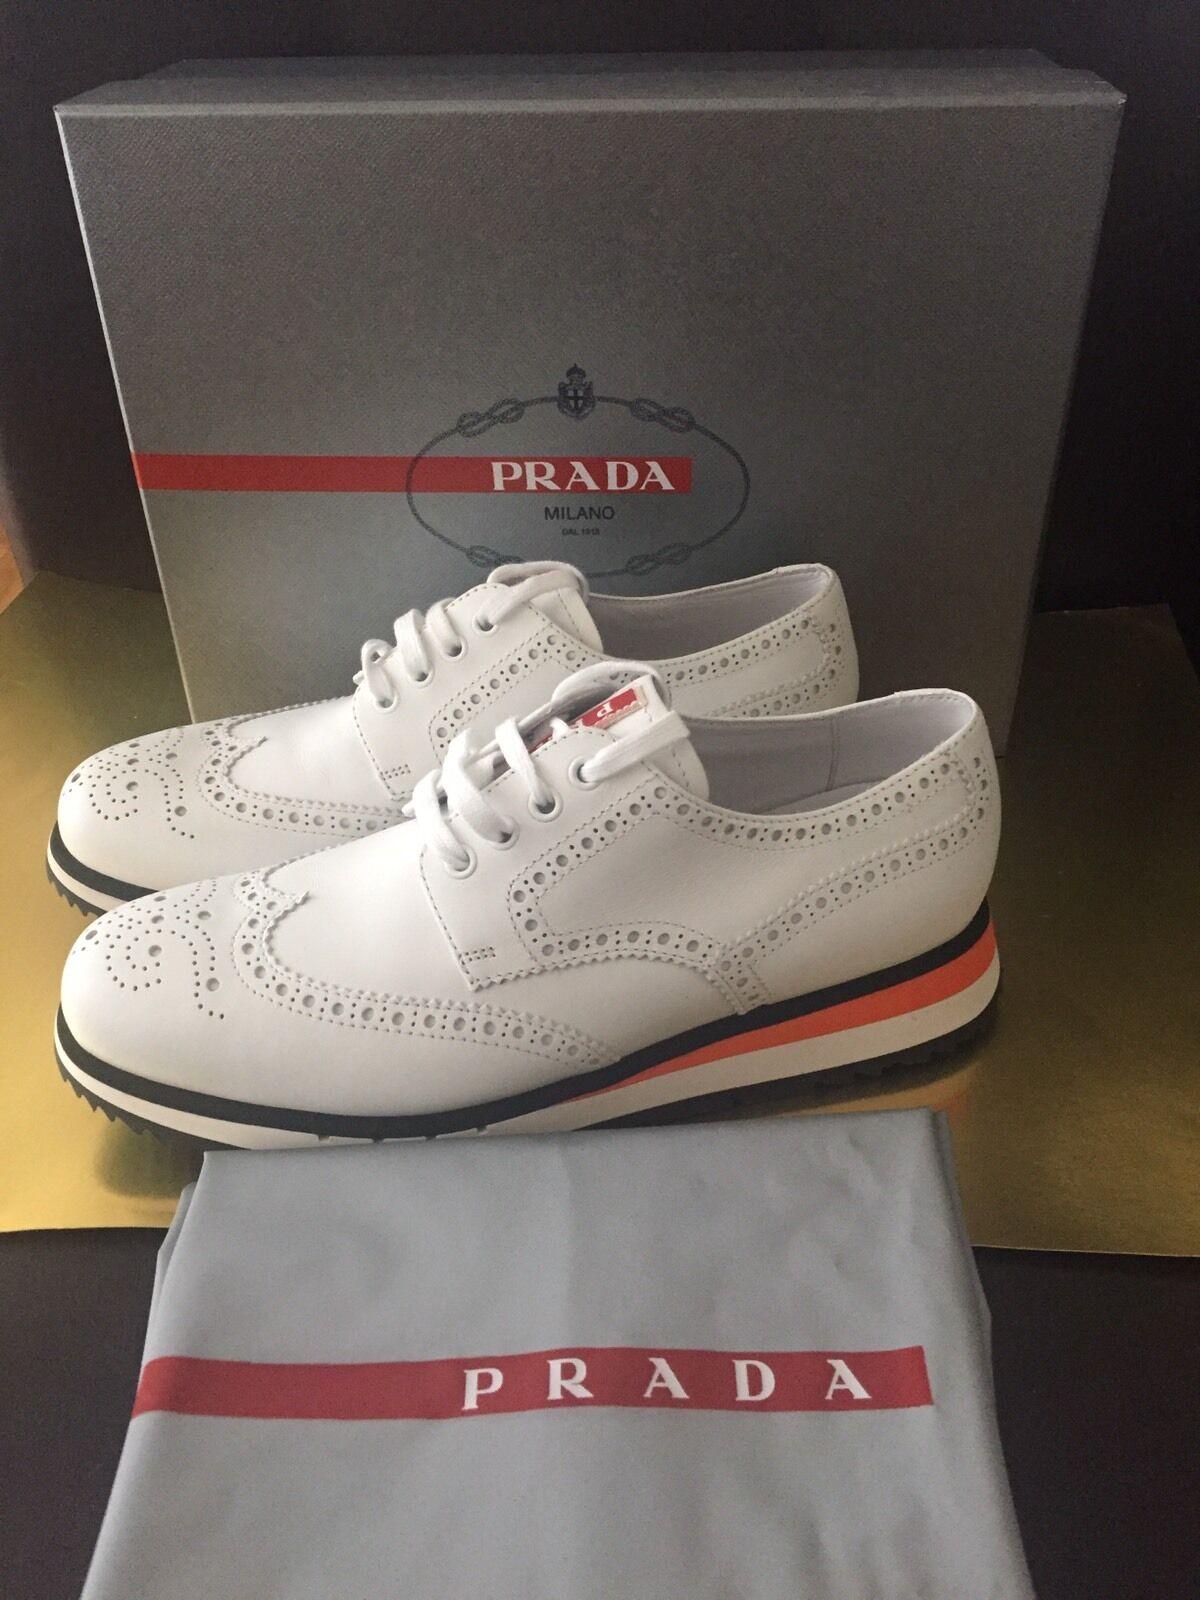 PRADA White Leather Sneakers NIB